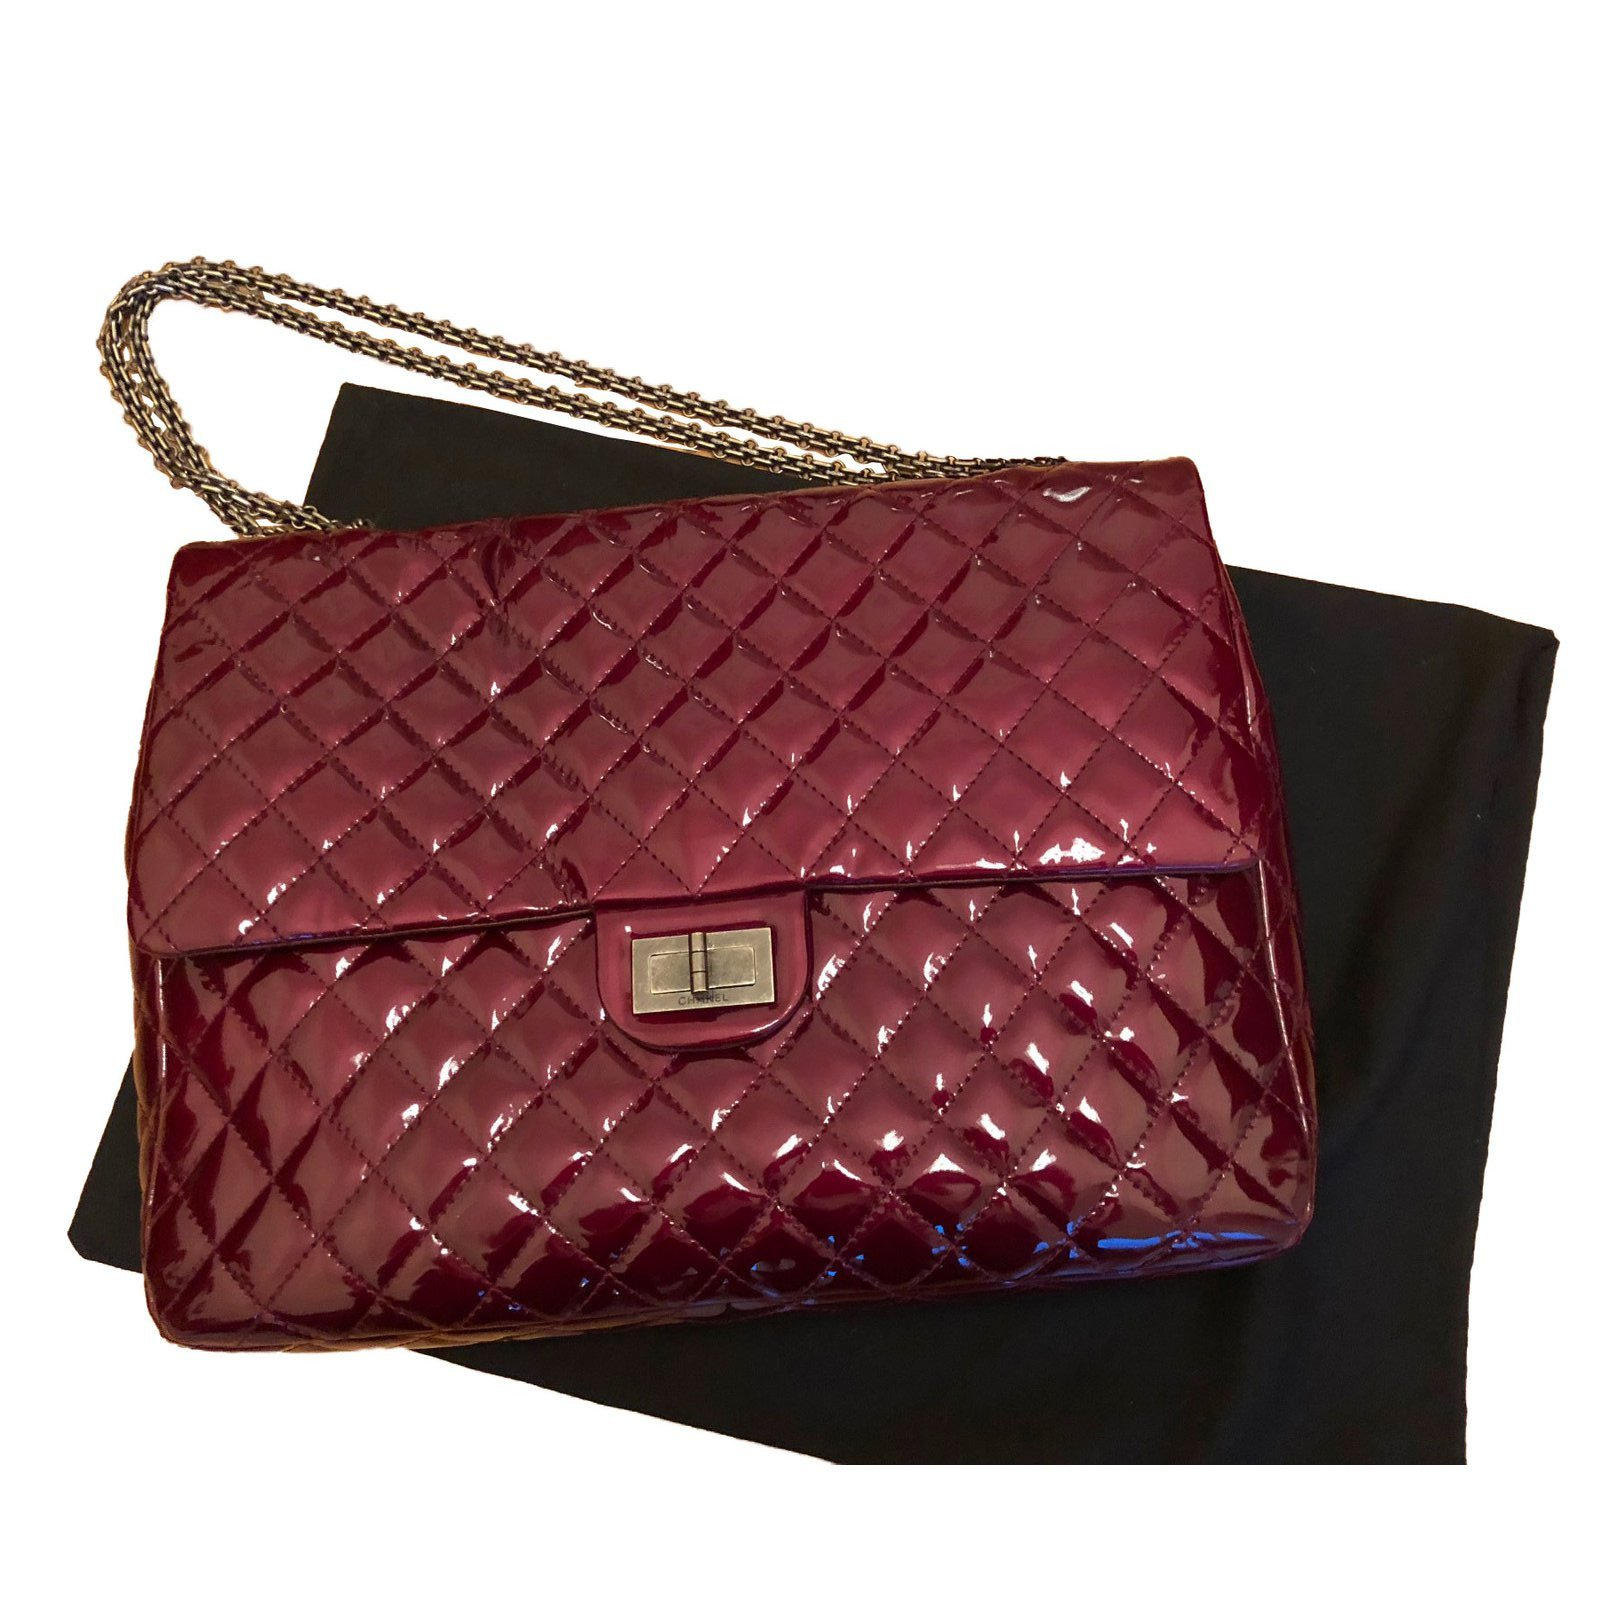 Chanel Burgundy Patent 2 55 Reissue Bag Handbags Leather Dark Red Ref 57839